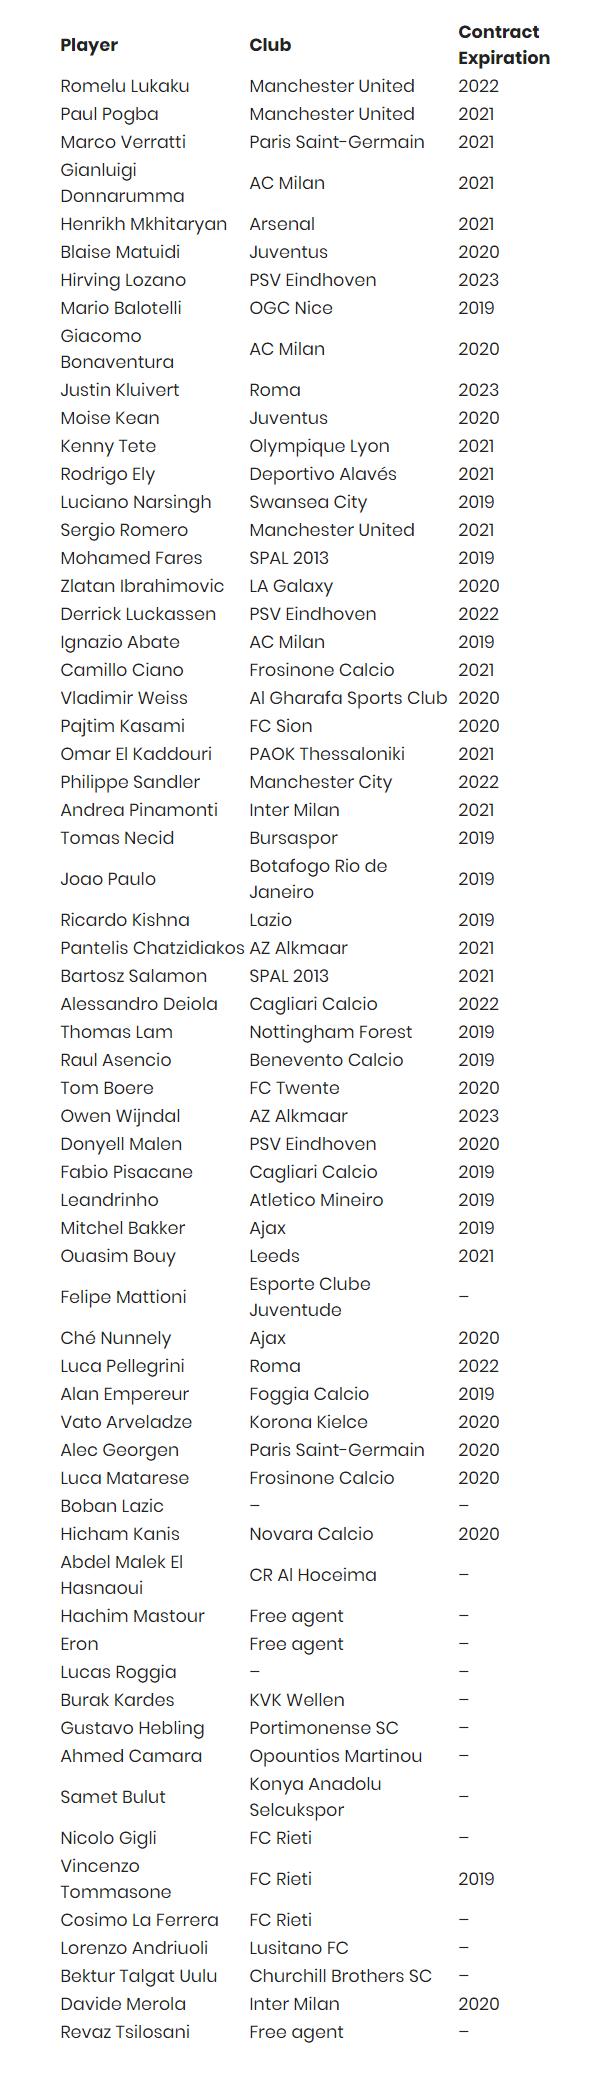 Mino Raiola's client list